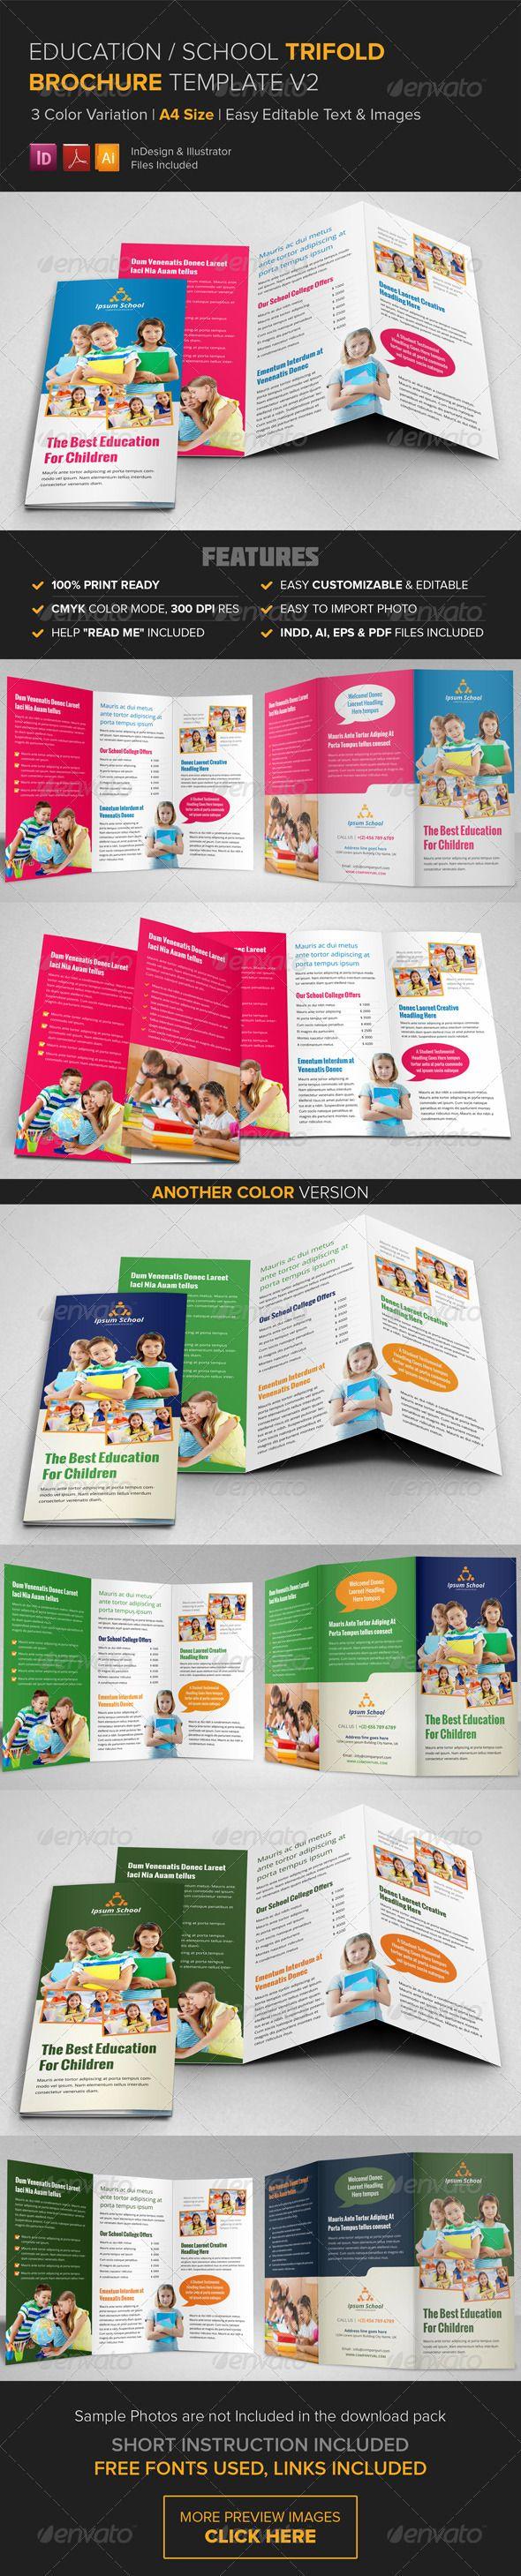 Education+School+Trifold+Brochure+Template+v2+